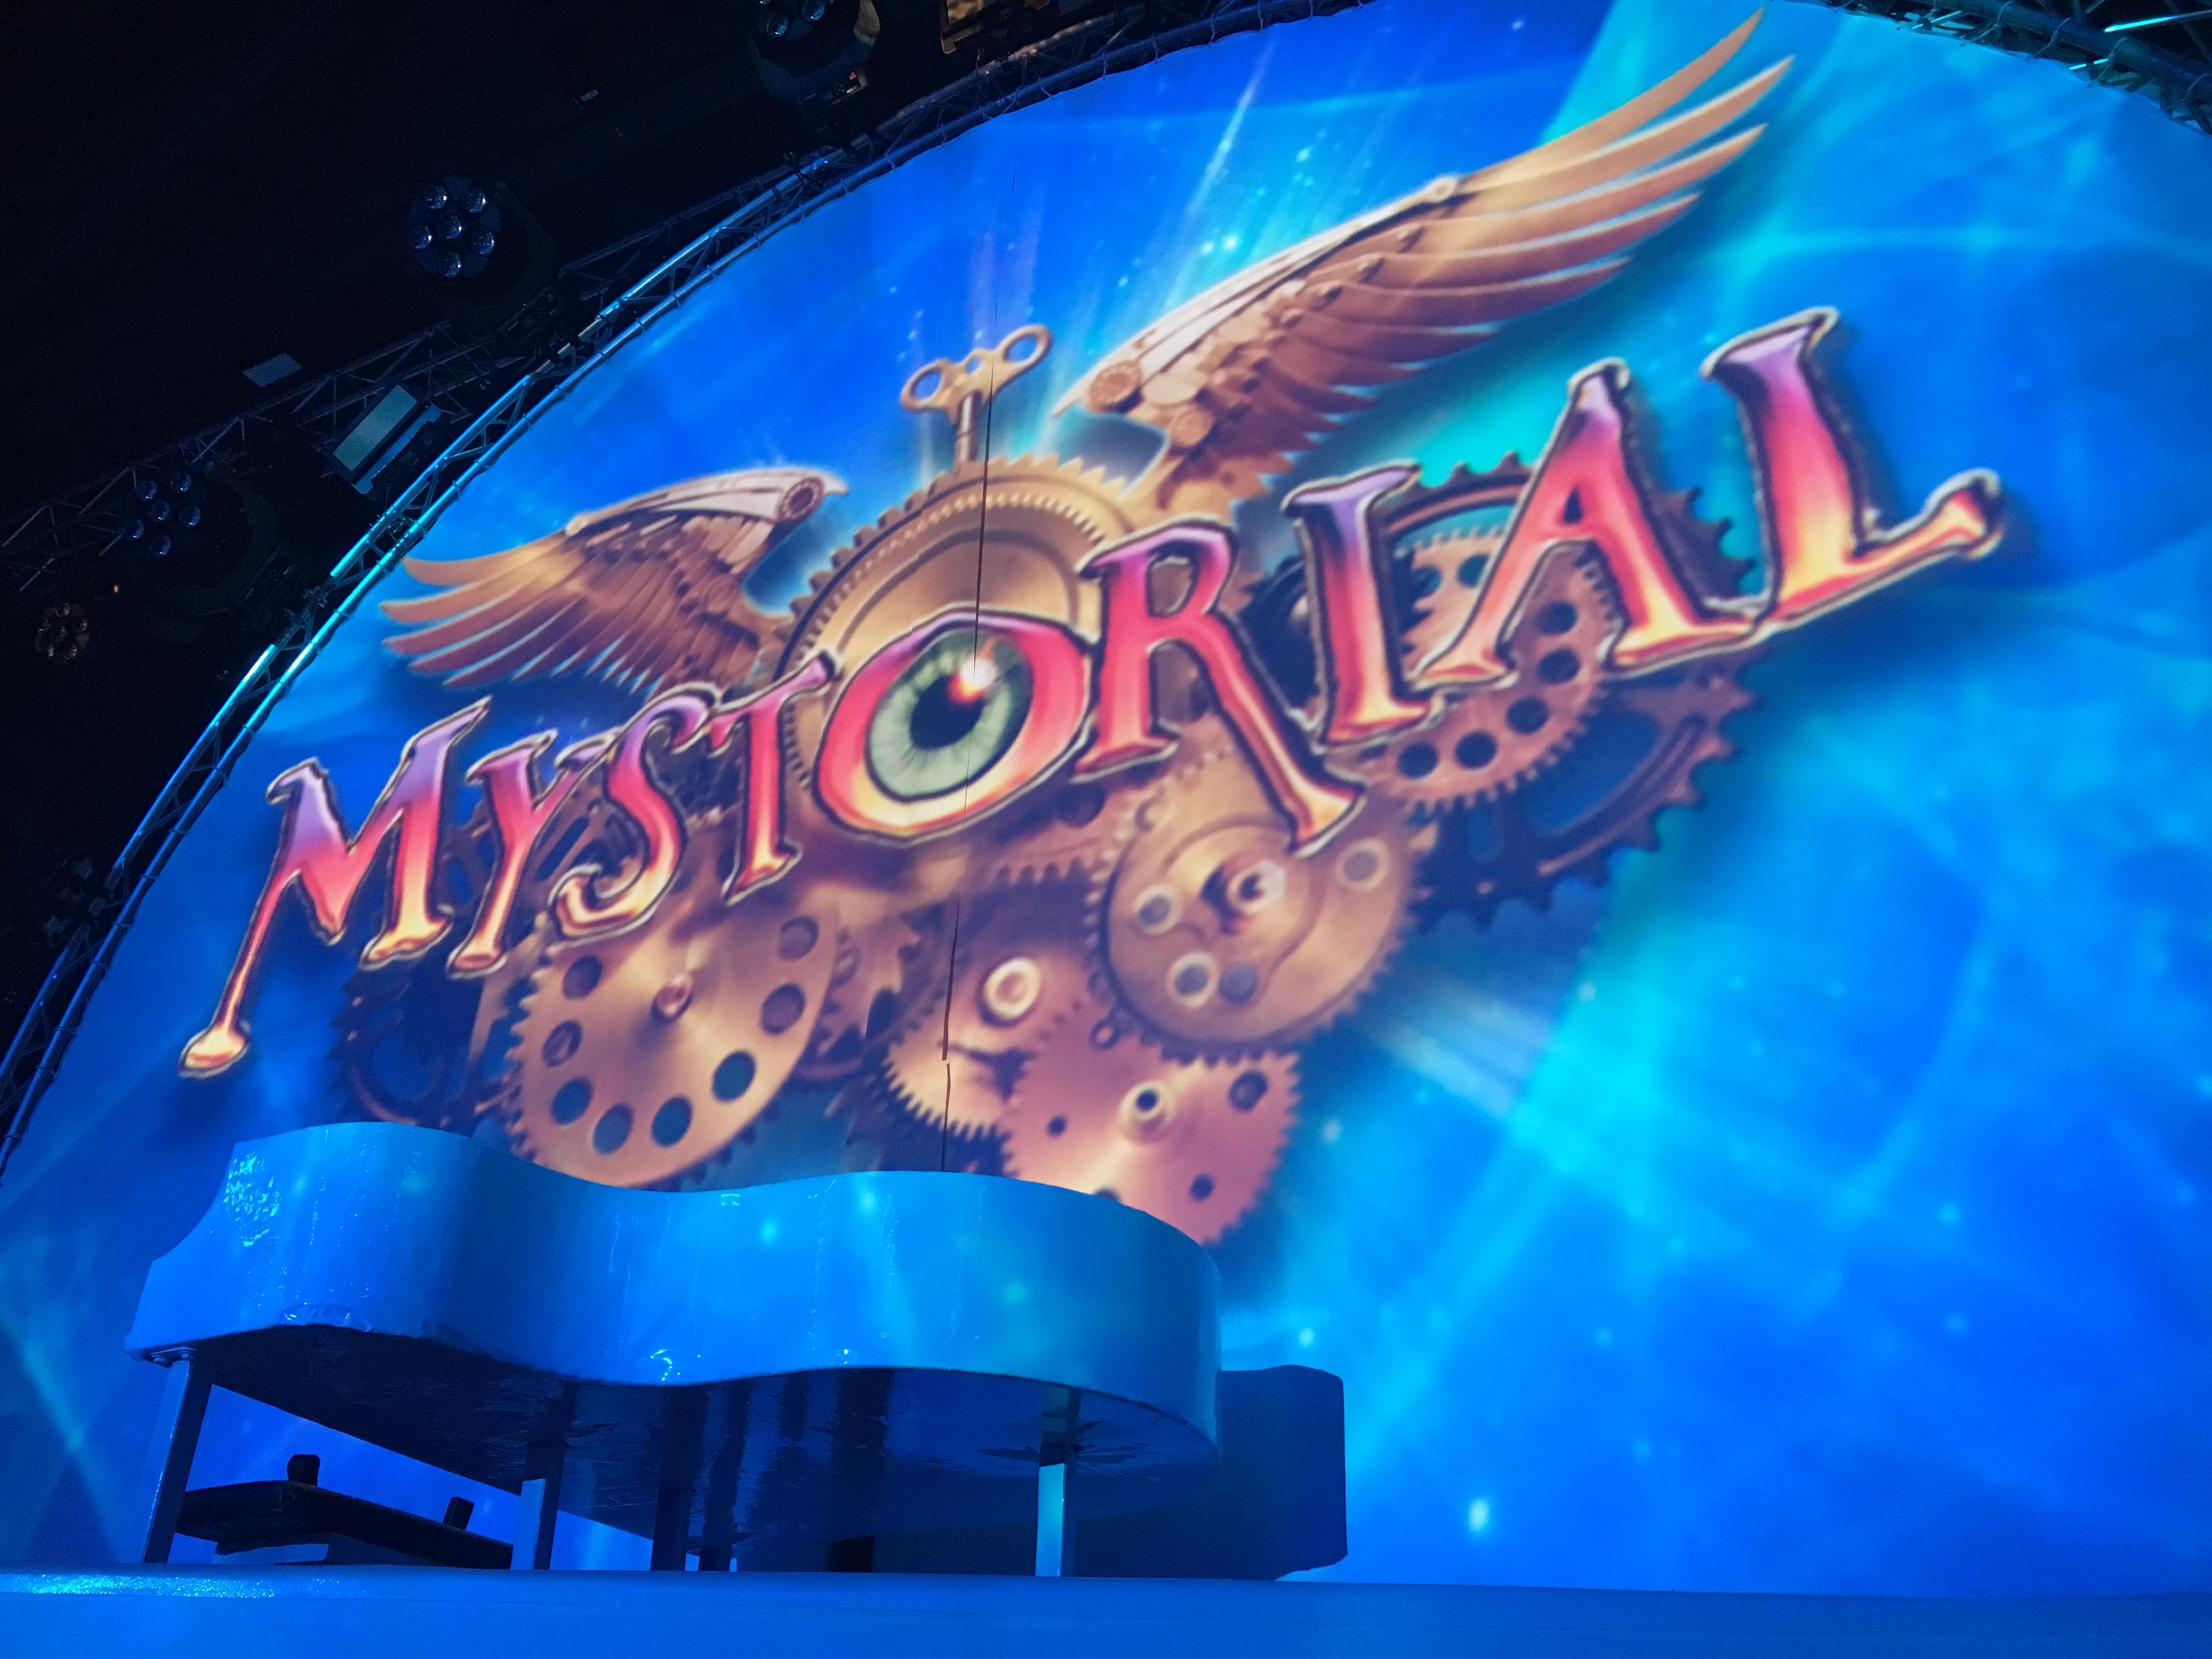 DJ BOBO Mystorial Tour